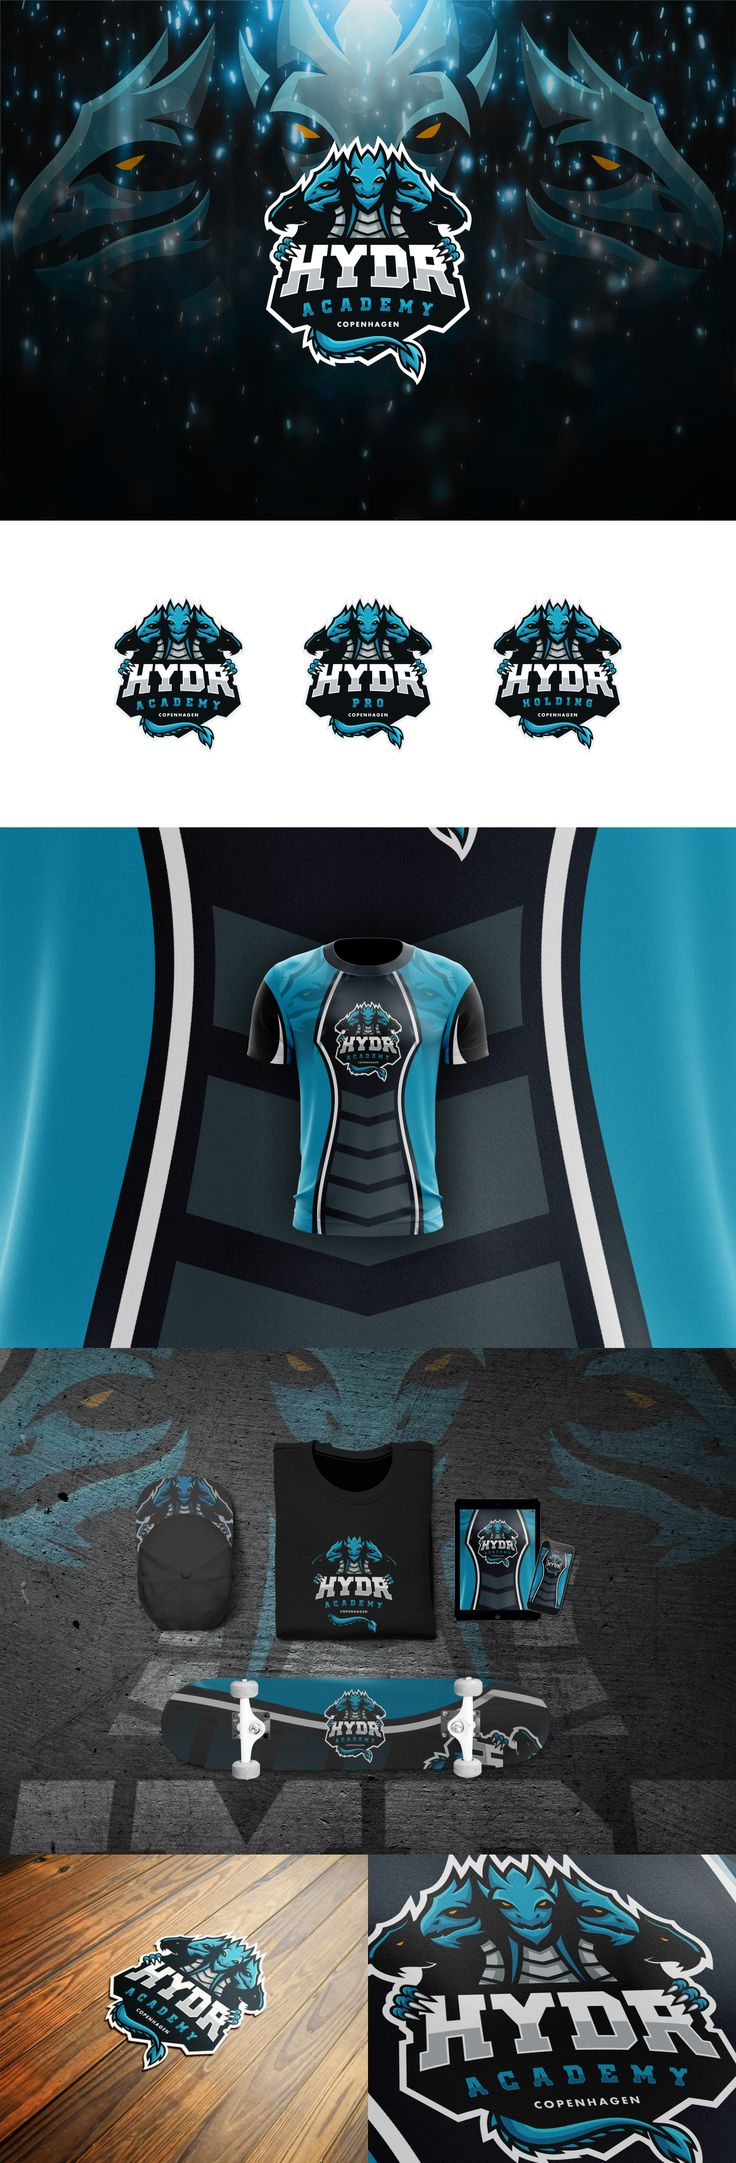 Illustrated Dragon Like Creatures For Hydra Academy An Esport Club Logo Design By J Ivan Gaming Branding Design Sports Logo Design Sports Logo Logo Design